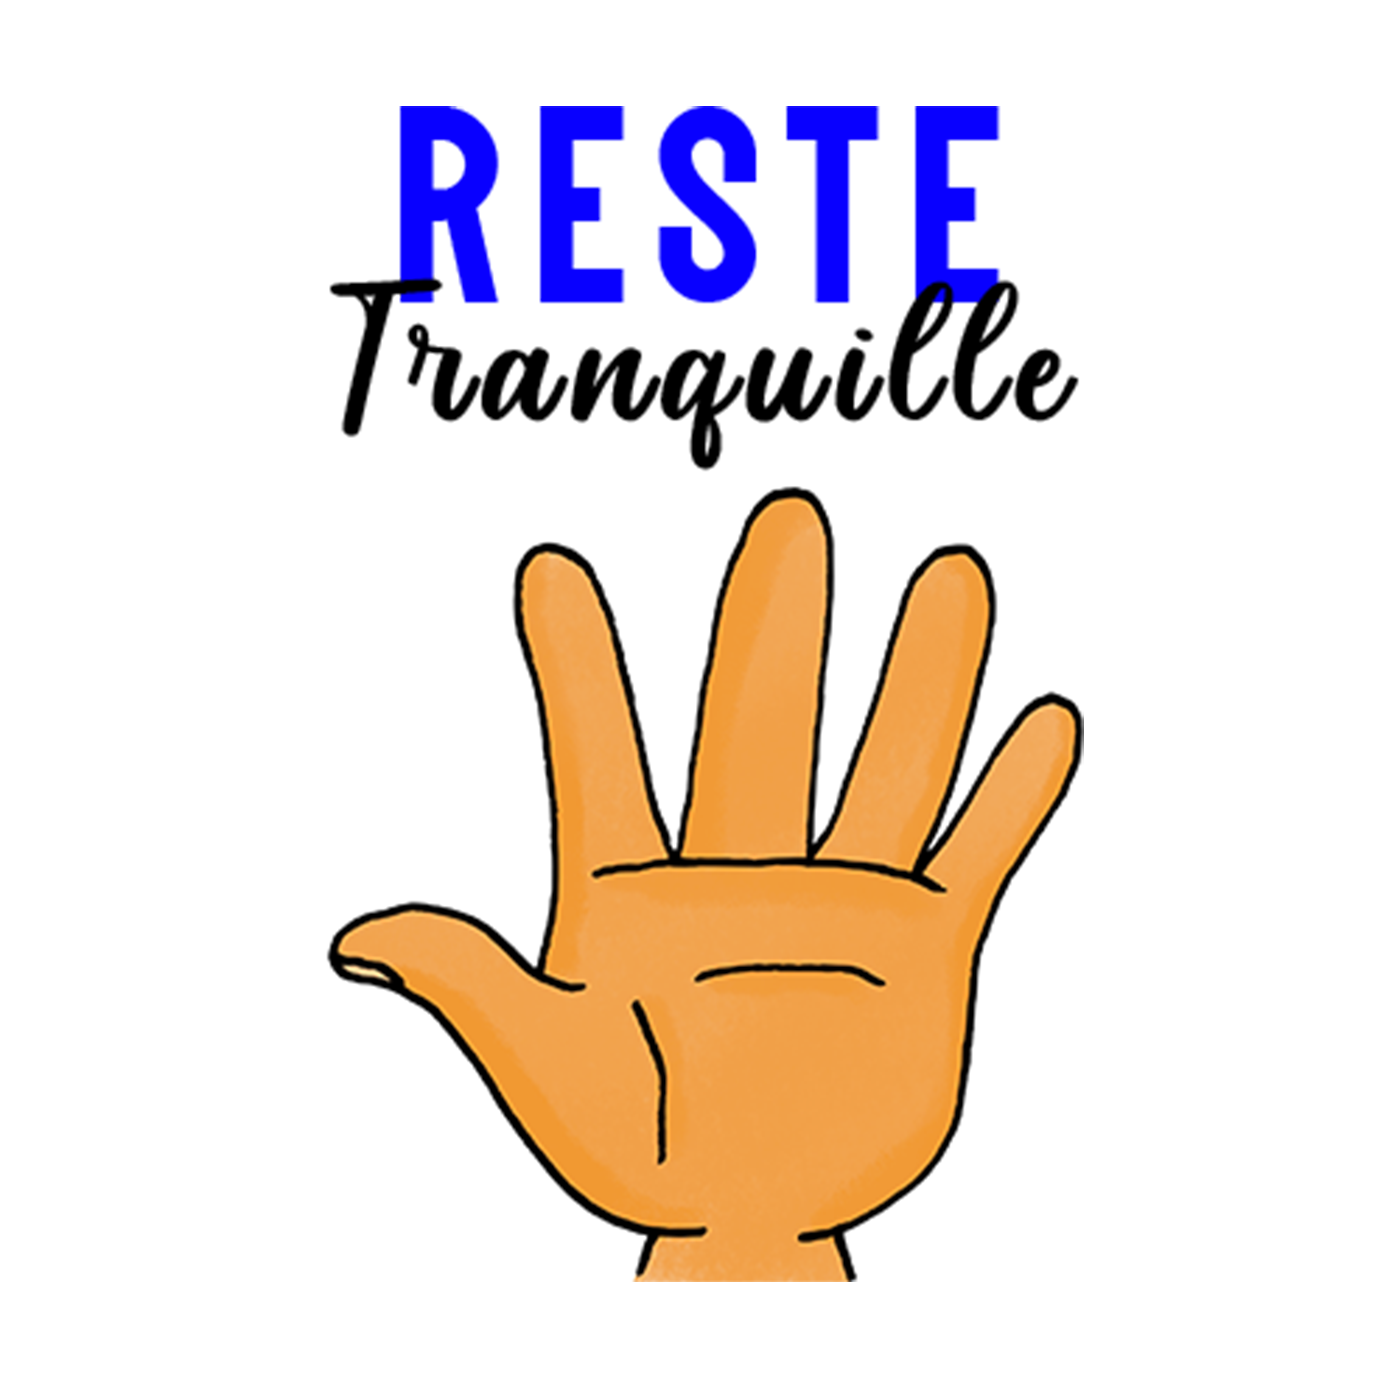 Reste Tranquille - Mer. 13 Jan. 2021